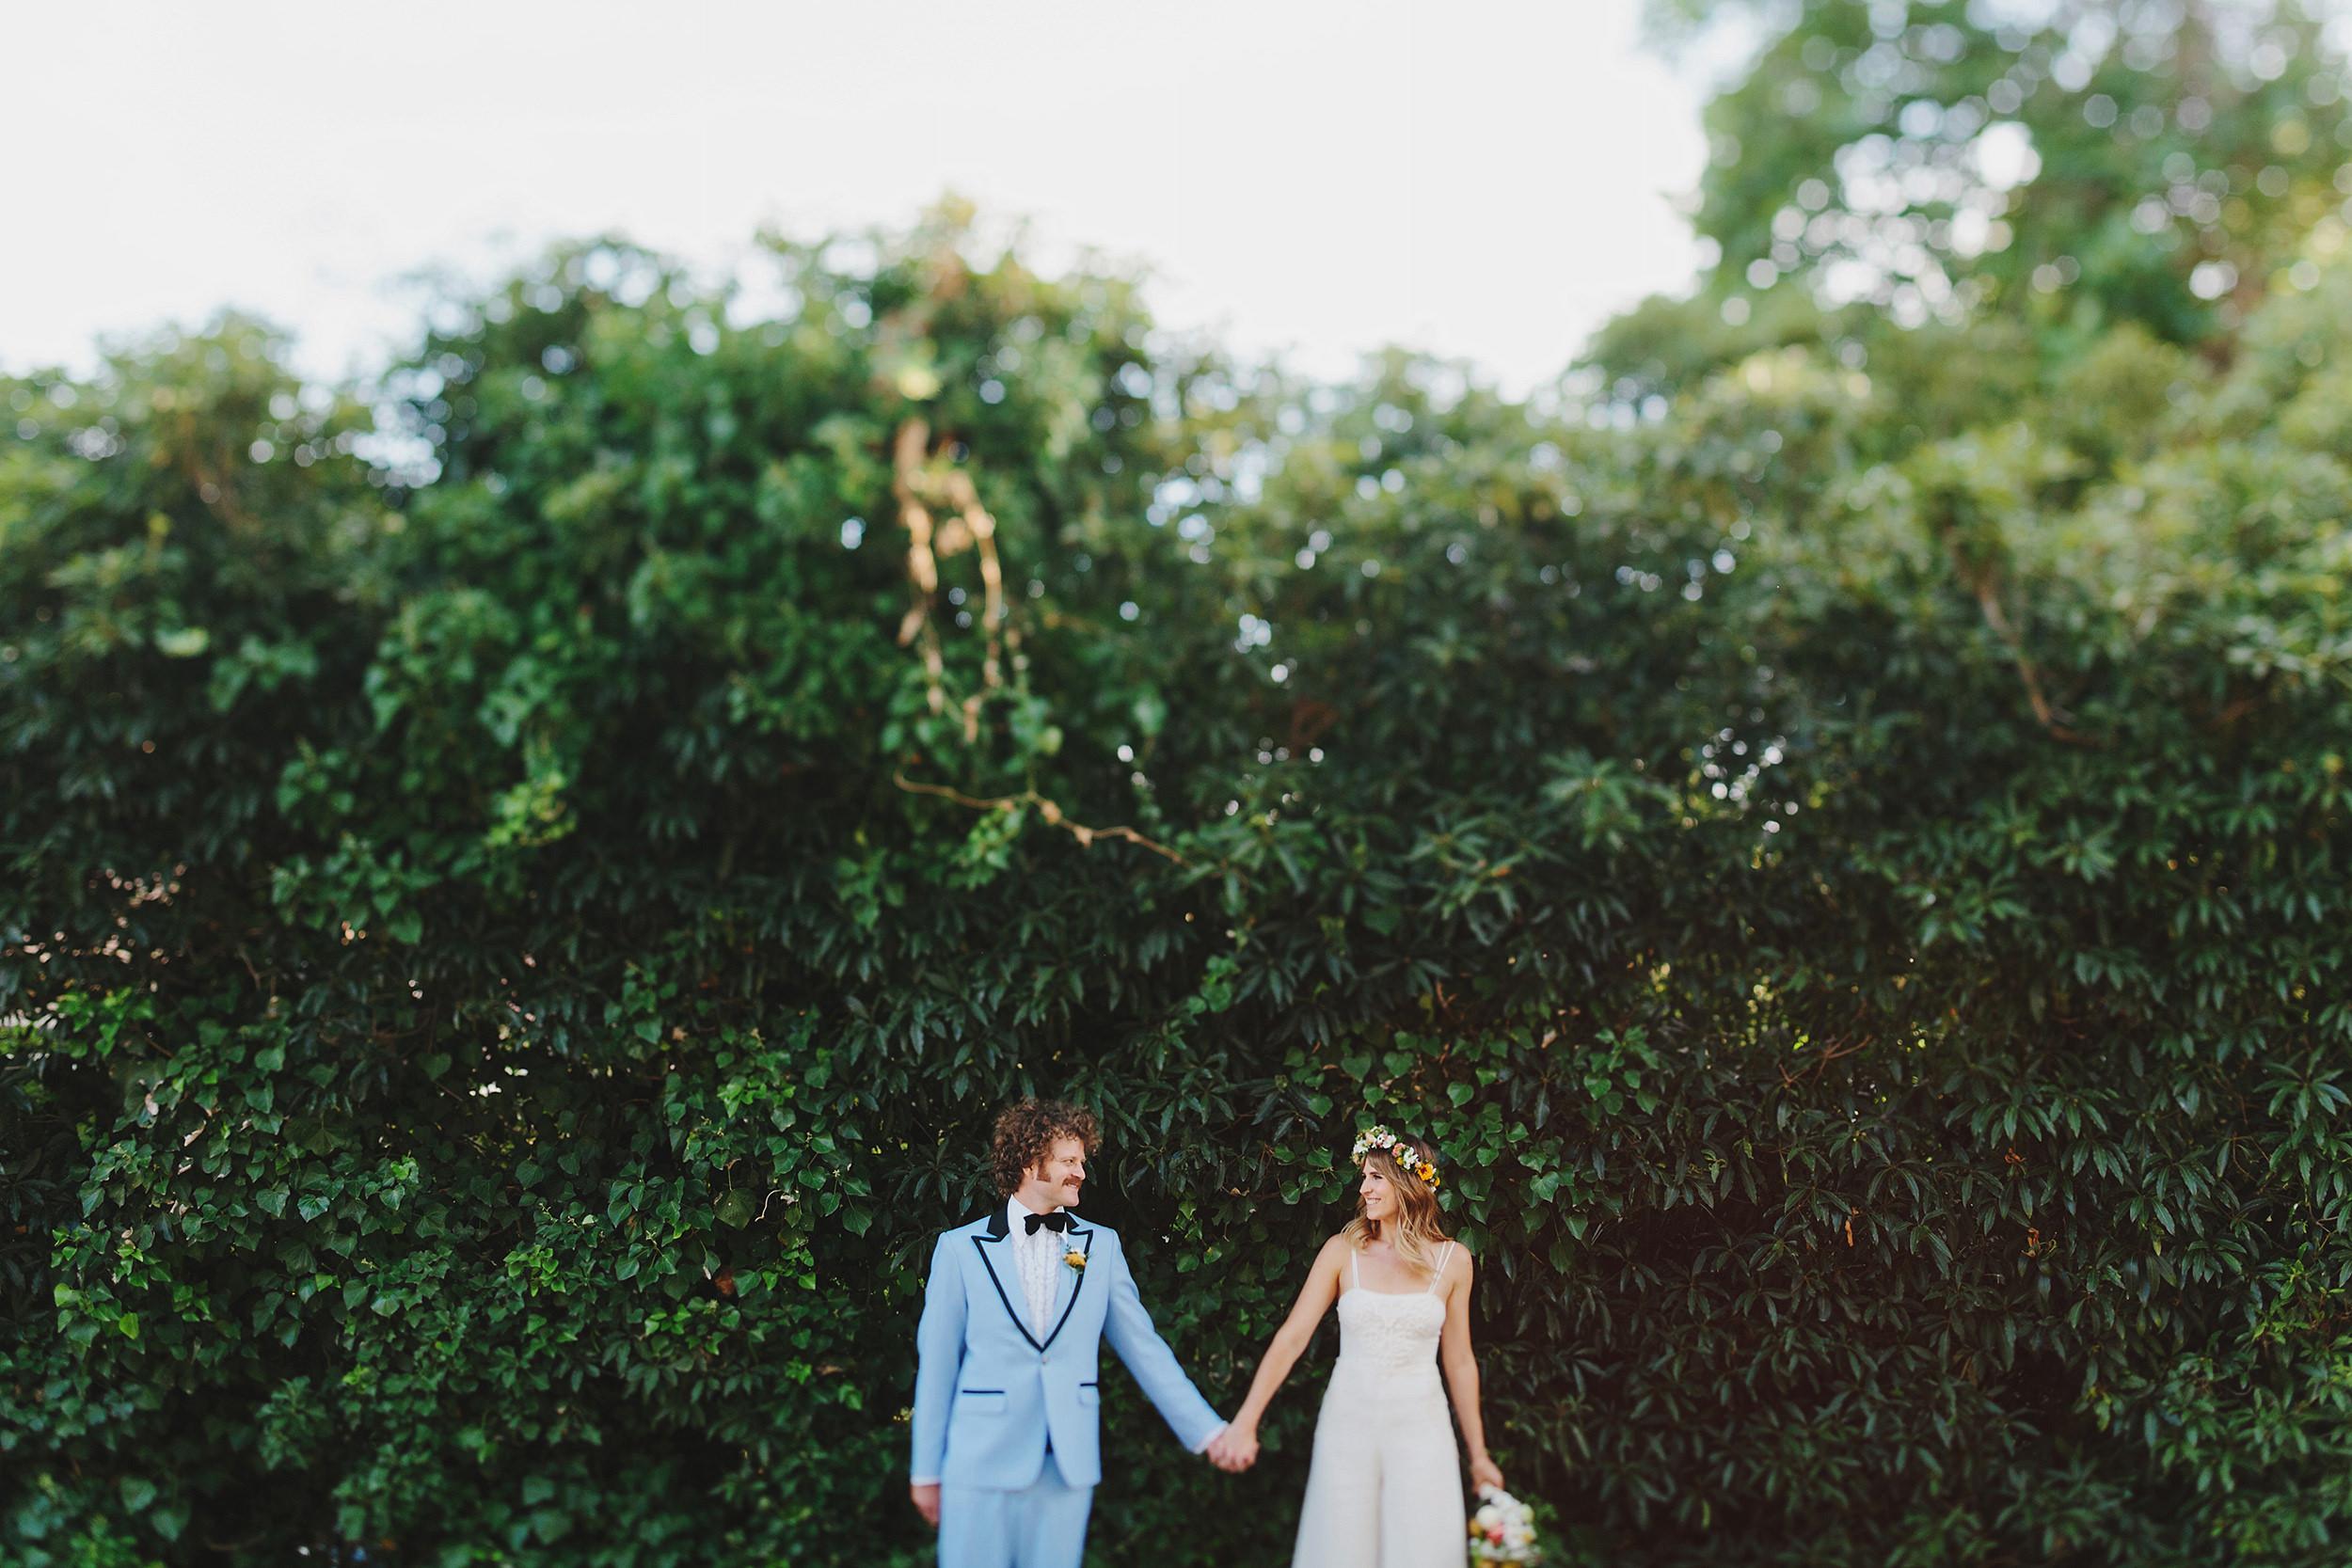 Melbourne_Vintage_Backyard_Wedding_Ben_Erin 049.JPG